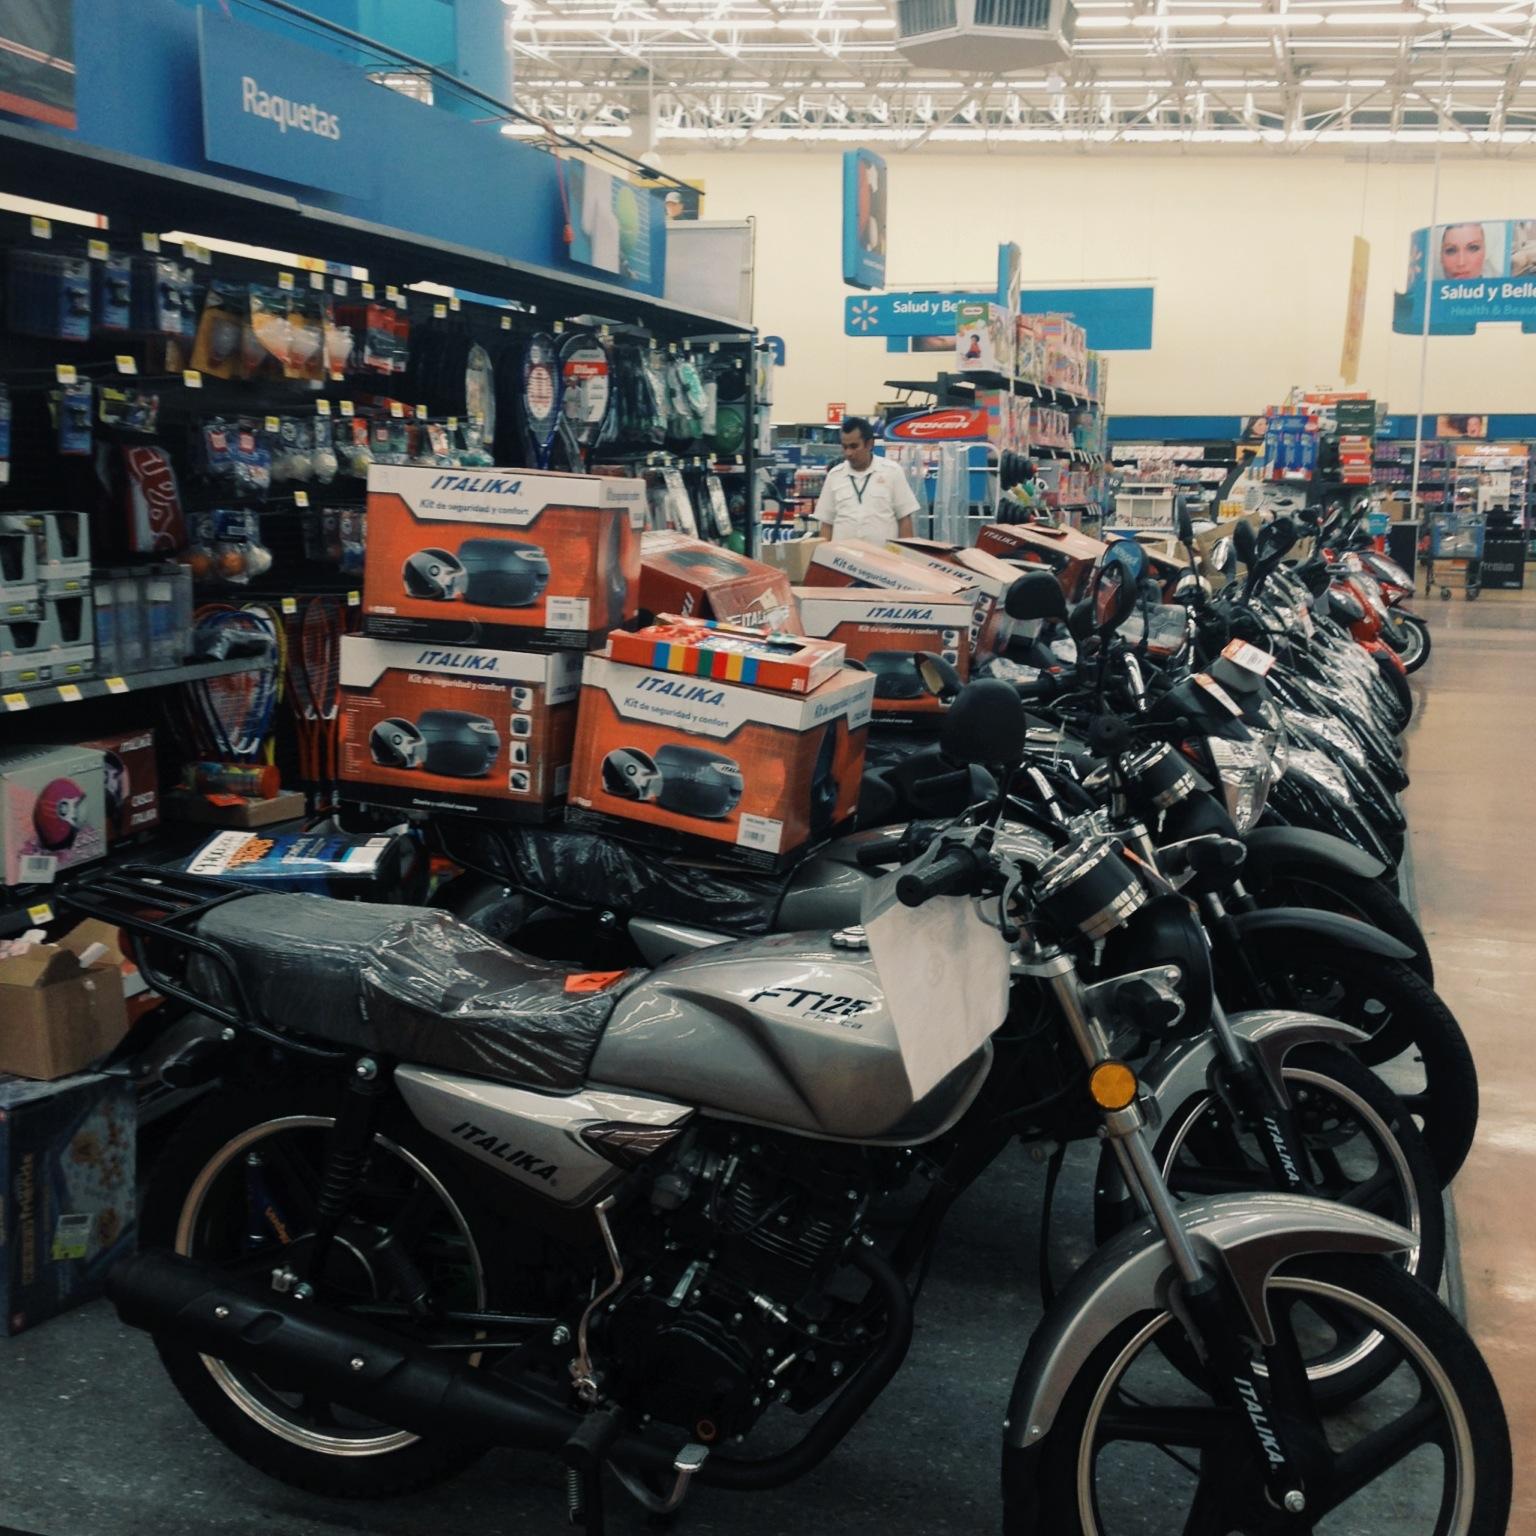 Walmart sells motos here